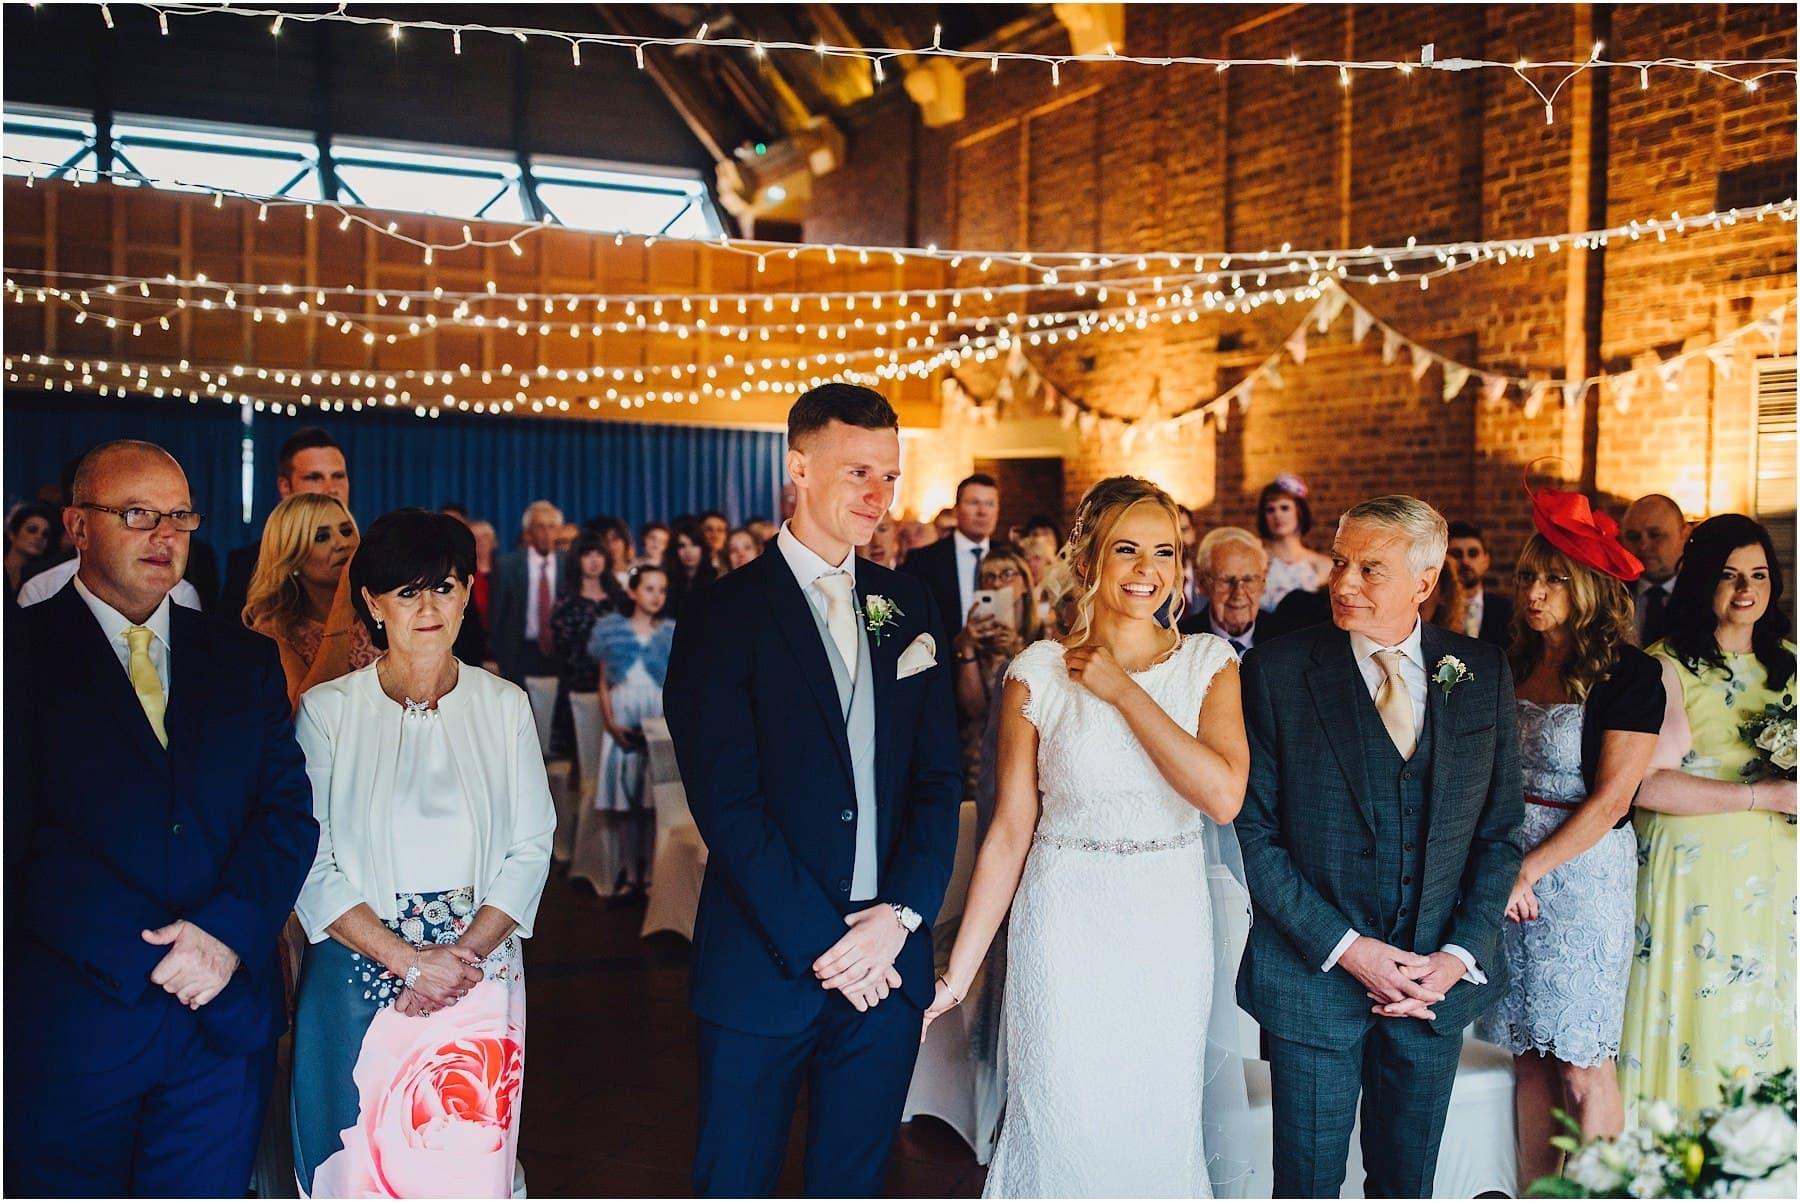 wedding ceremony at Avoncroft